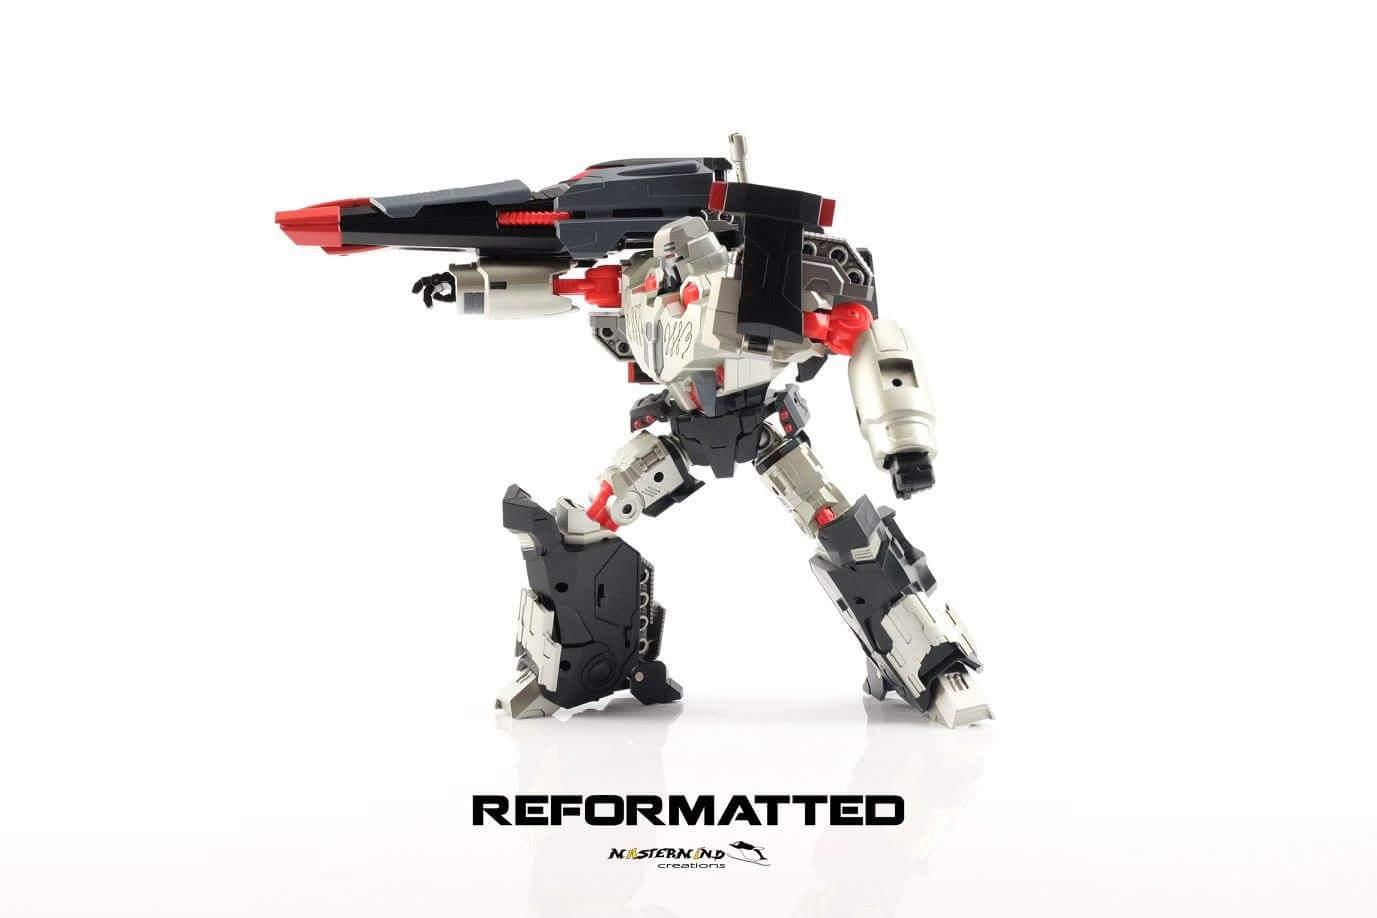 [Mastermind Creations] Produit Tiers - Reformatted R-28 Tyrantron - aka Megatron des BD IDW JwxJJx2H